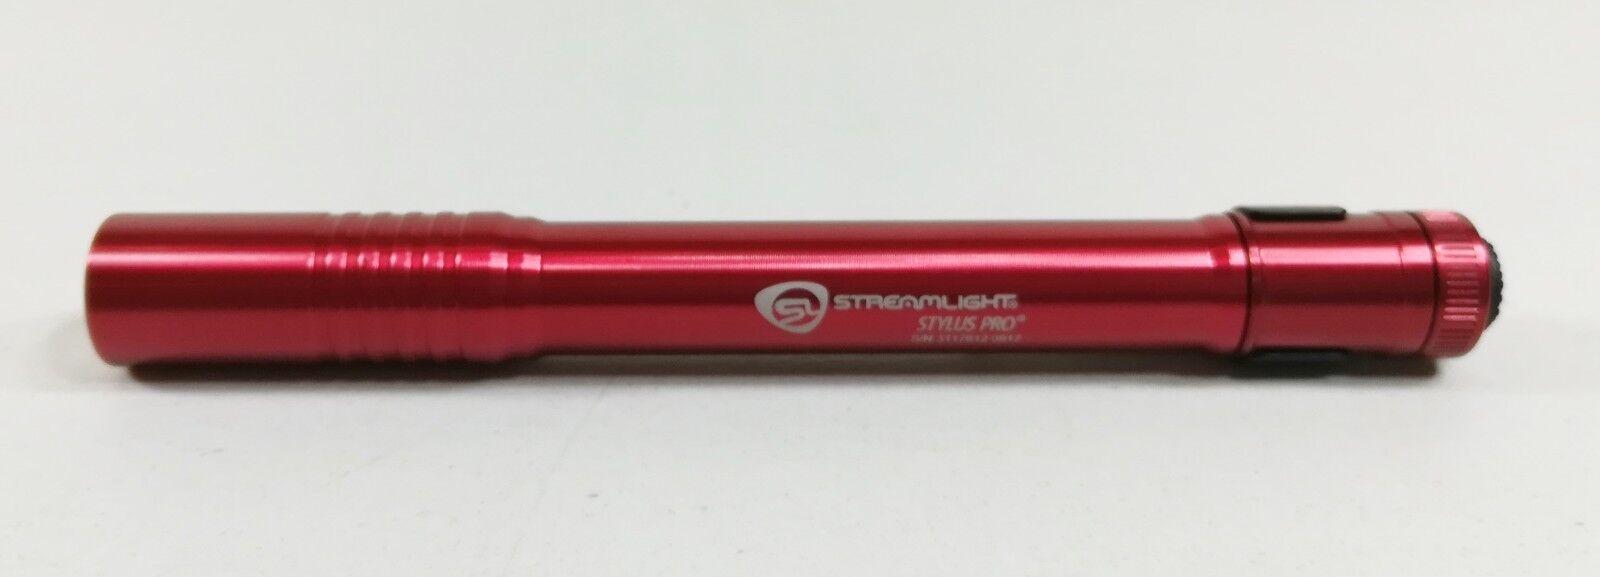 Streamlight 66120 Stylus Pro Flashlight Red for sale online